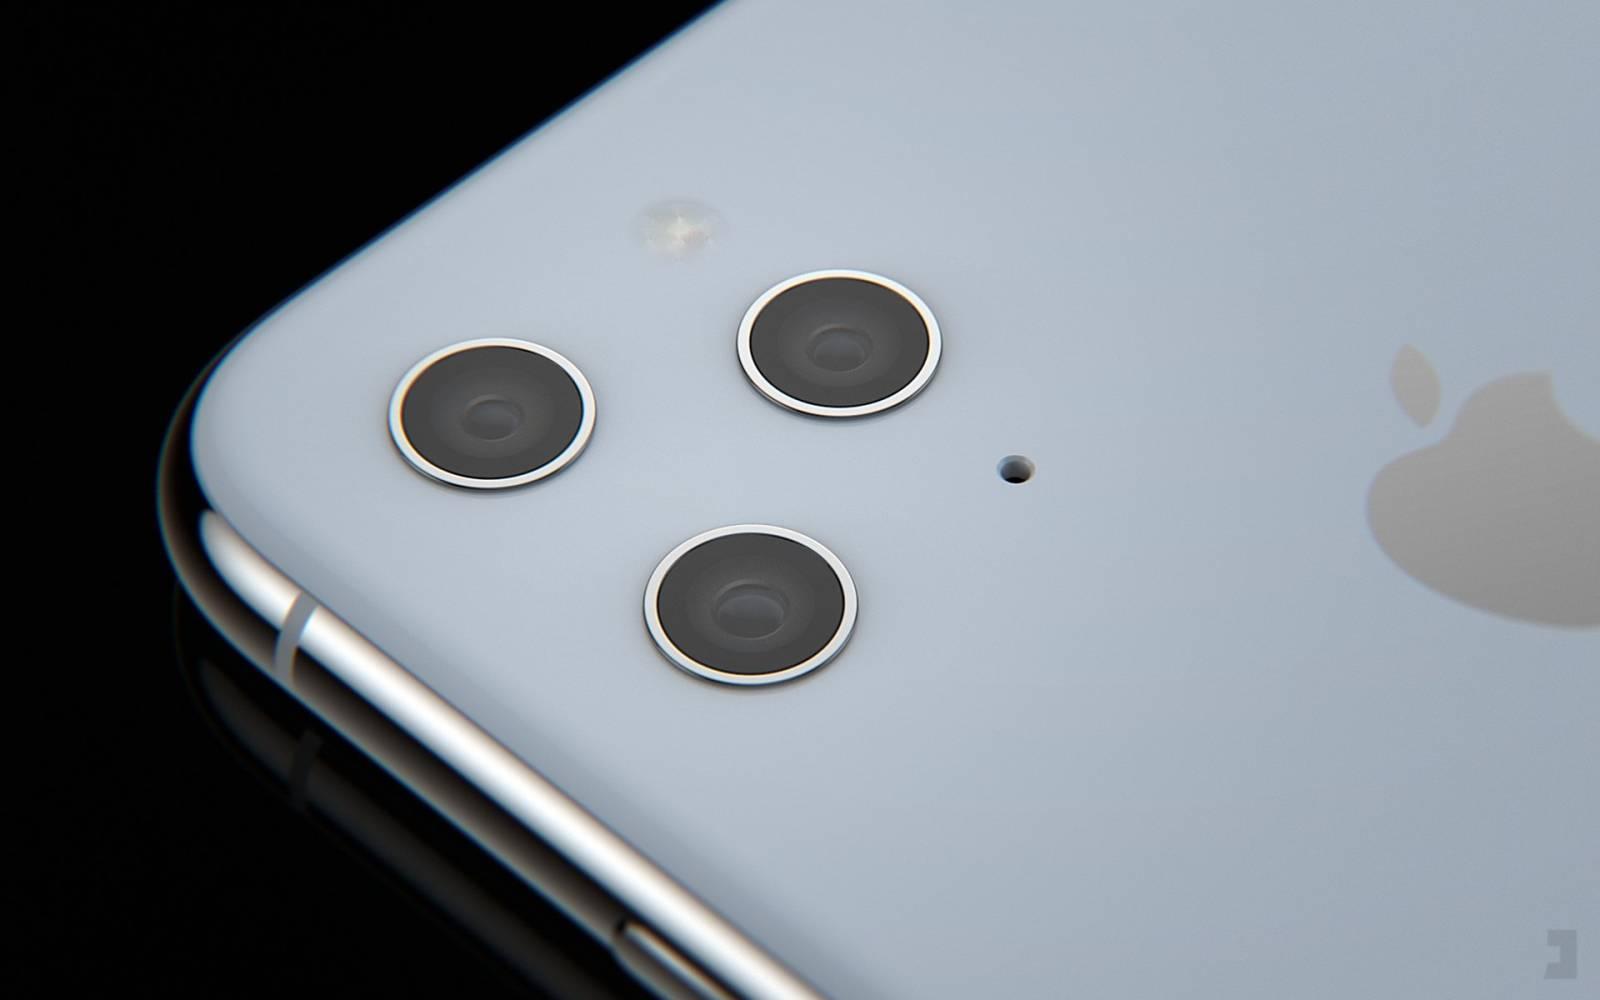 iPhone 11 ram 2019